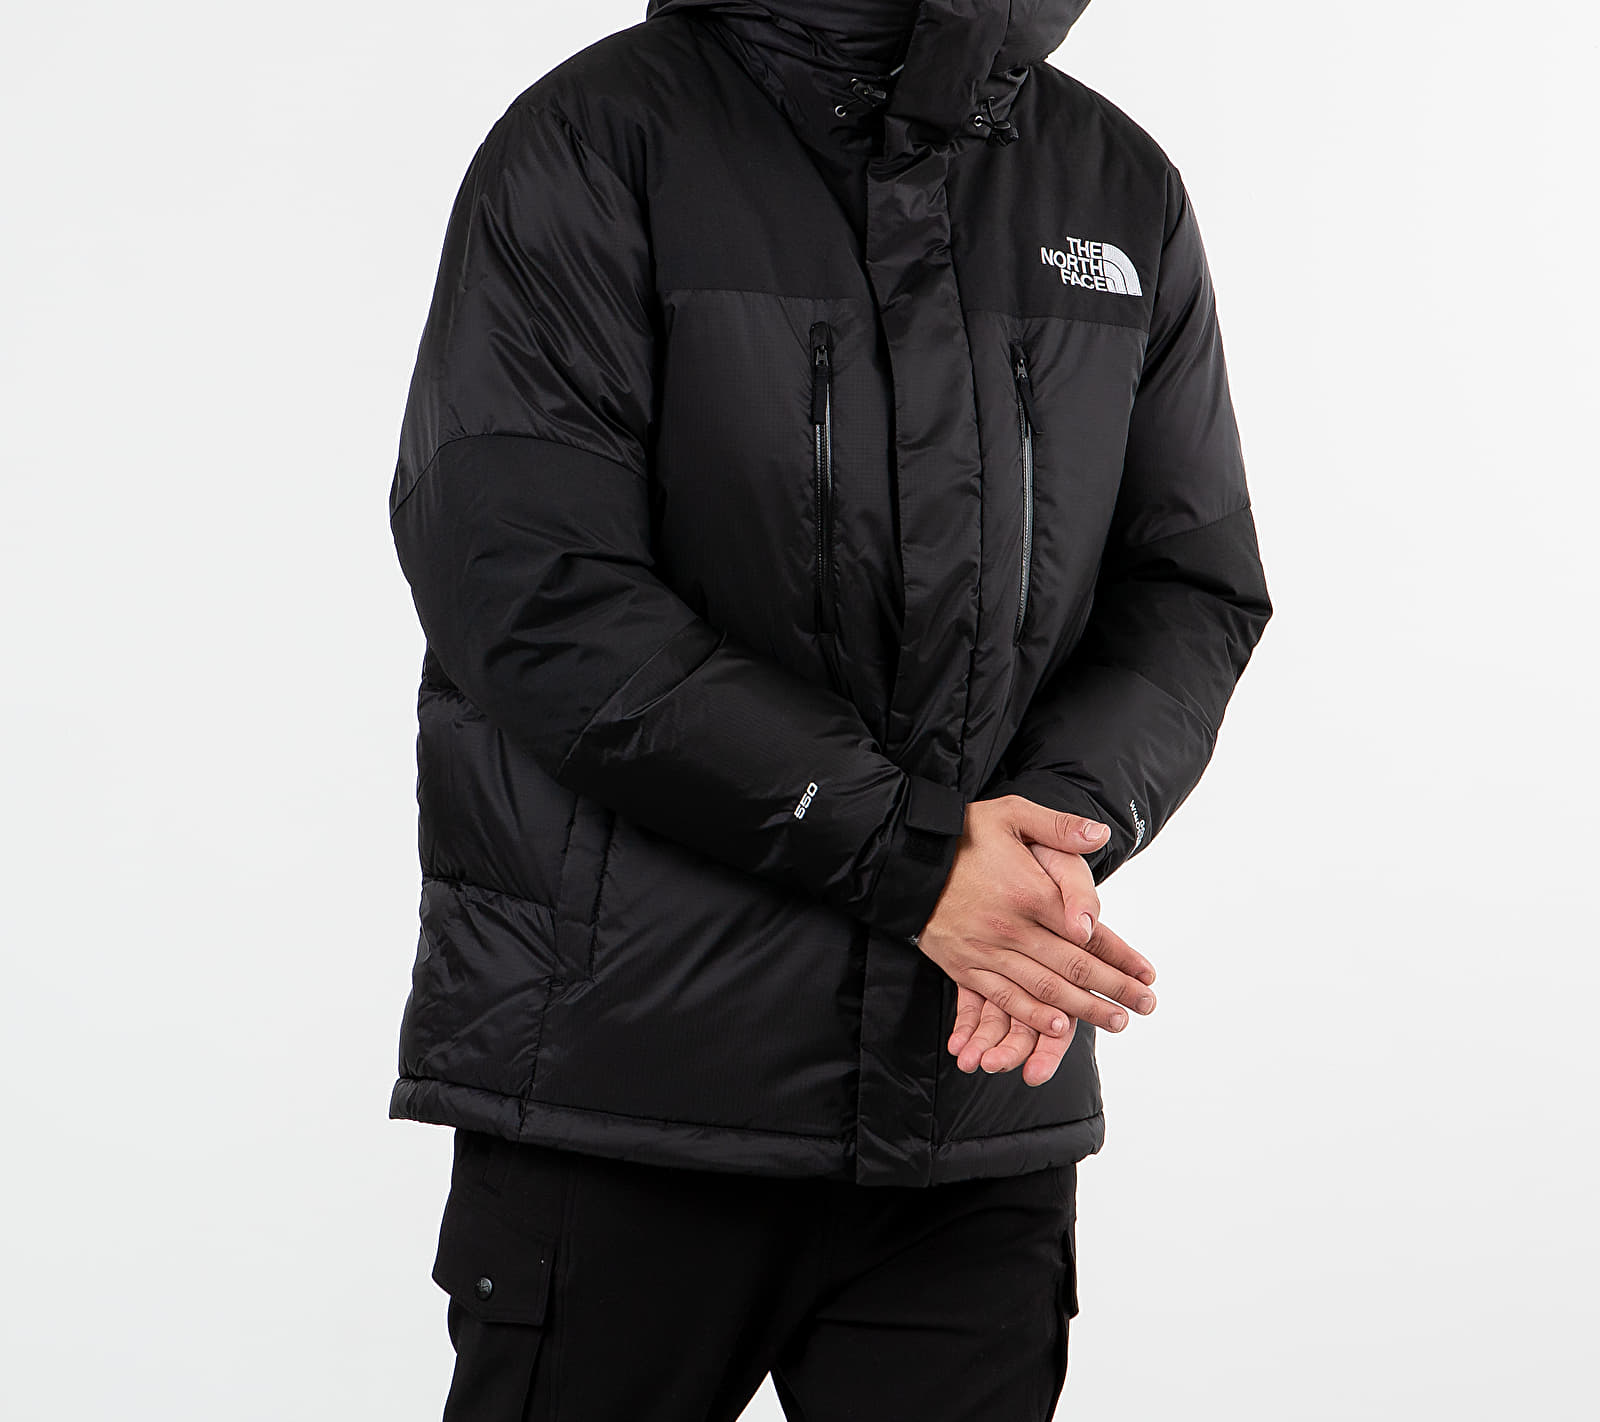 The North Face Jacket Black L